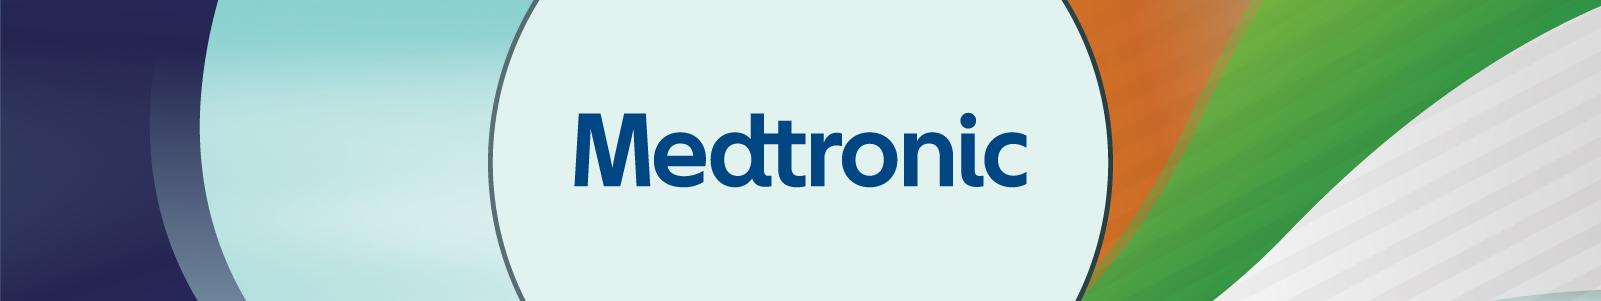 ETED2021-banner-medtronic